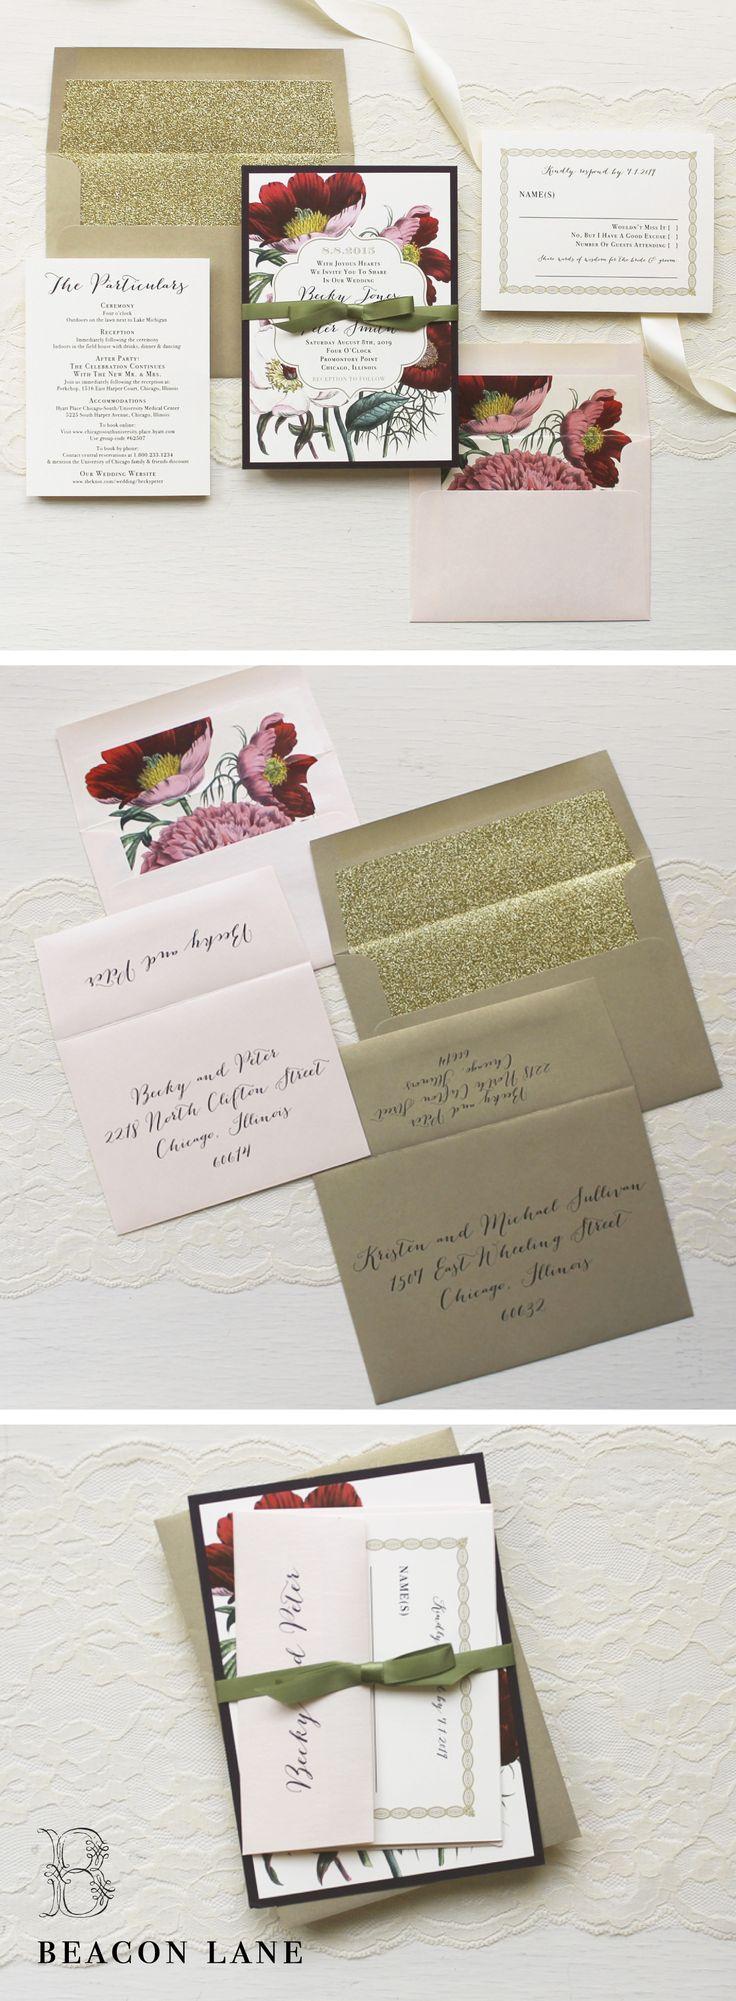 138 Best Jewel Tone Wedding Images On Pinterest Weddings Jewel